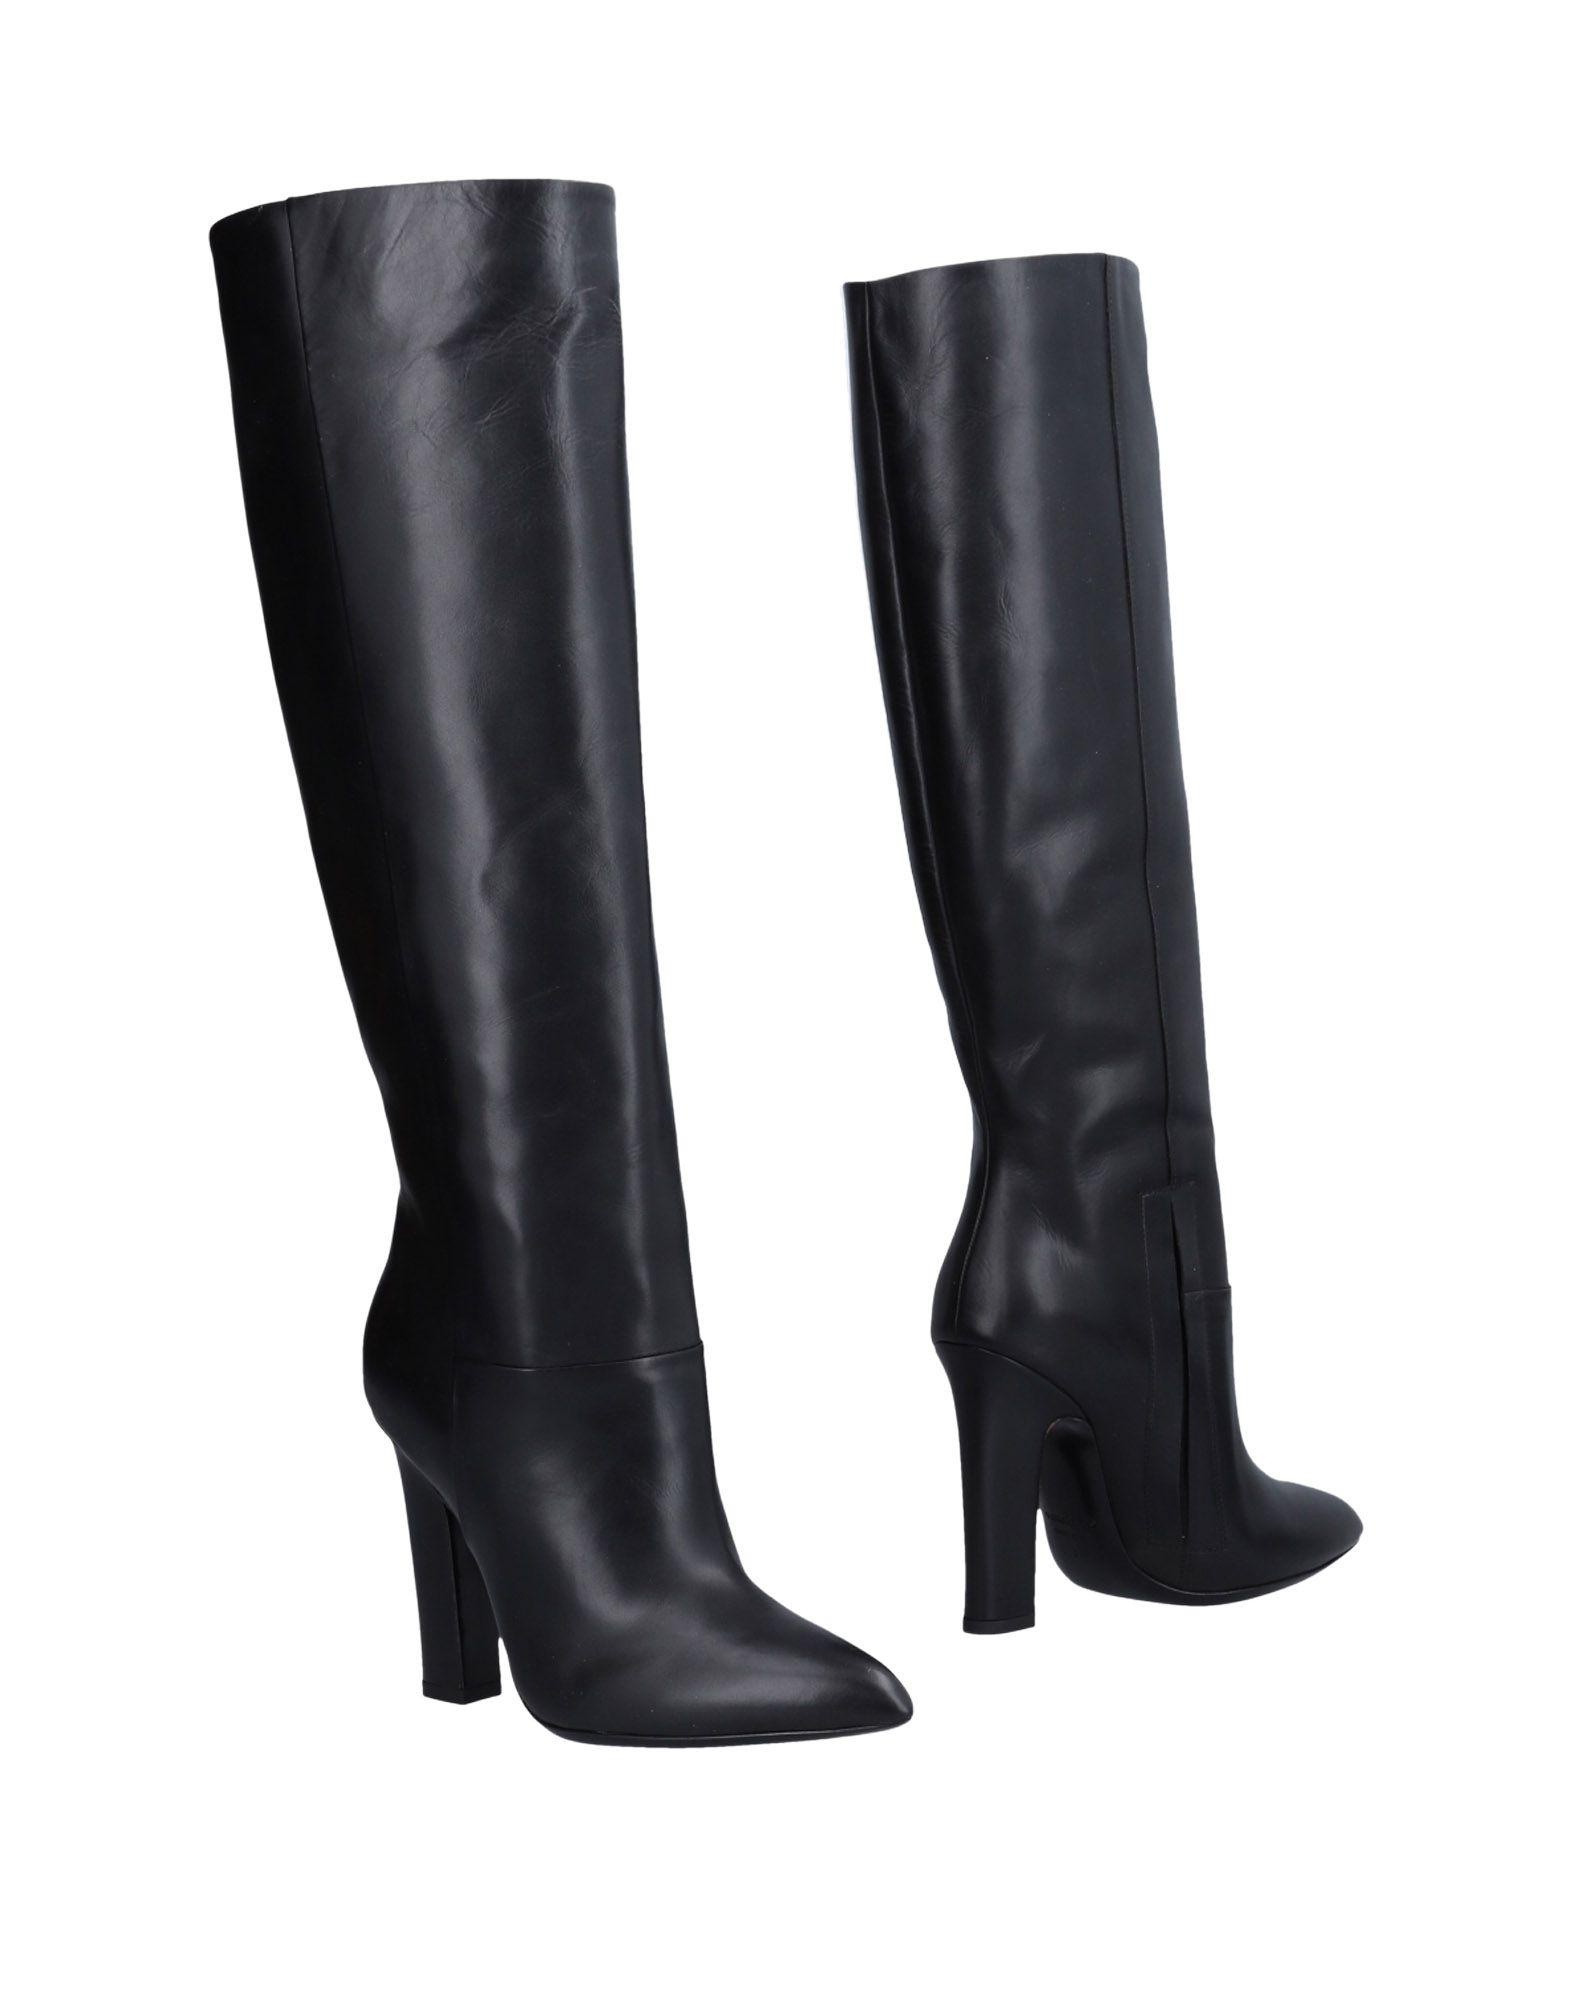 newest 2b811 a6563 DEIMILLE Boots - Footwear | YOOX.COM